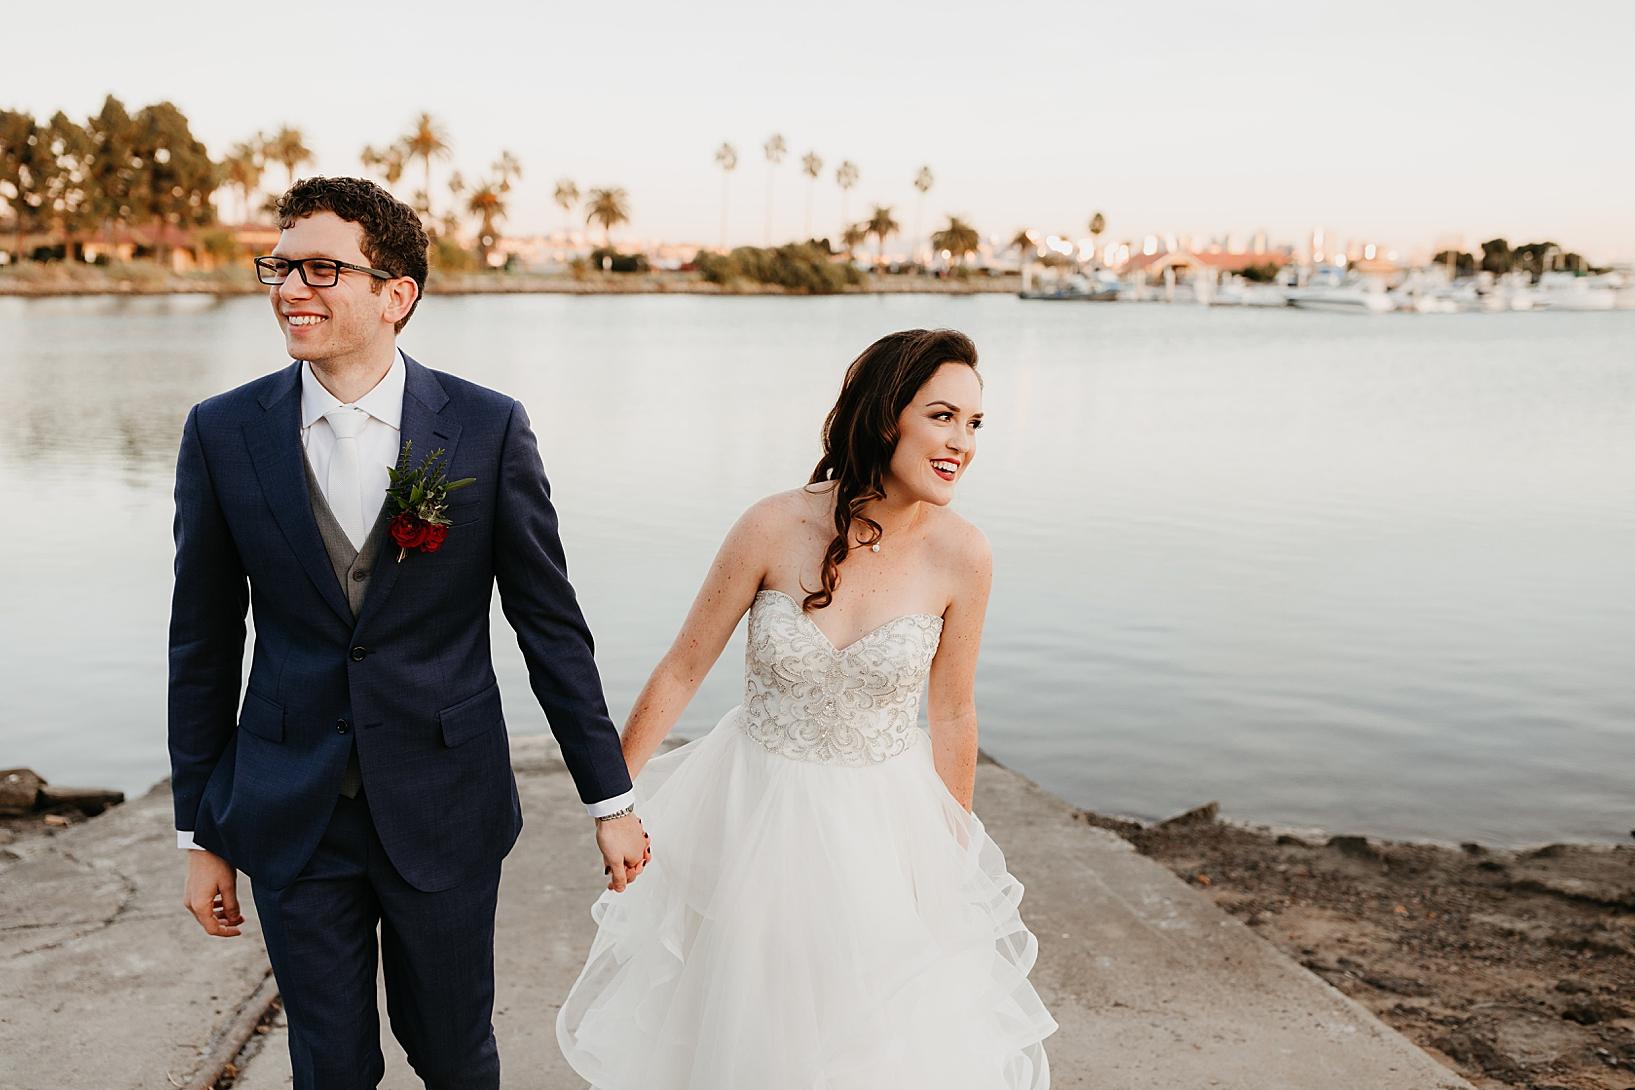 Brick-San-Diego-Winter-Wedding-43.jpg